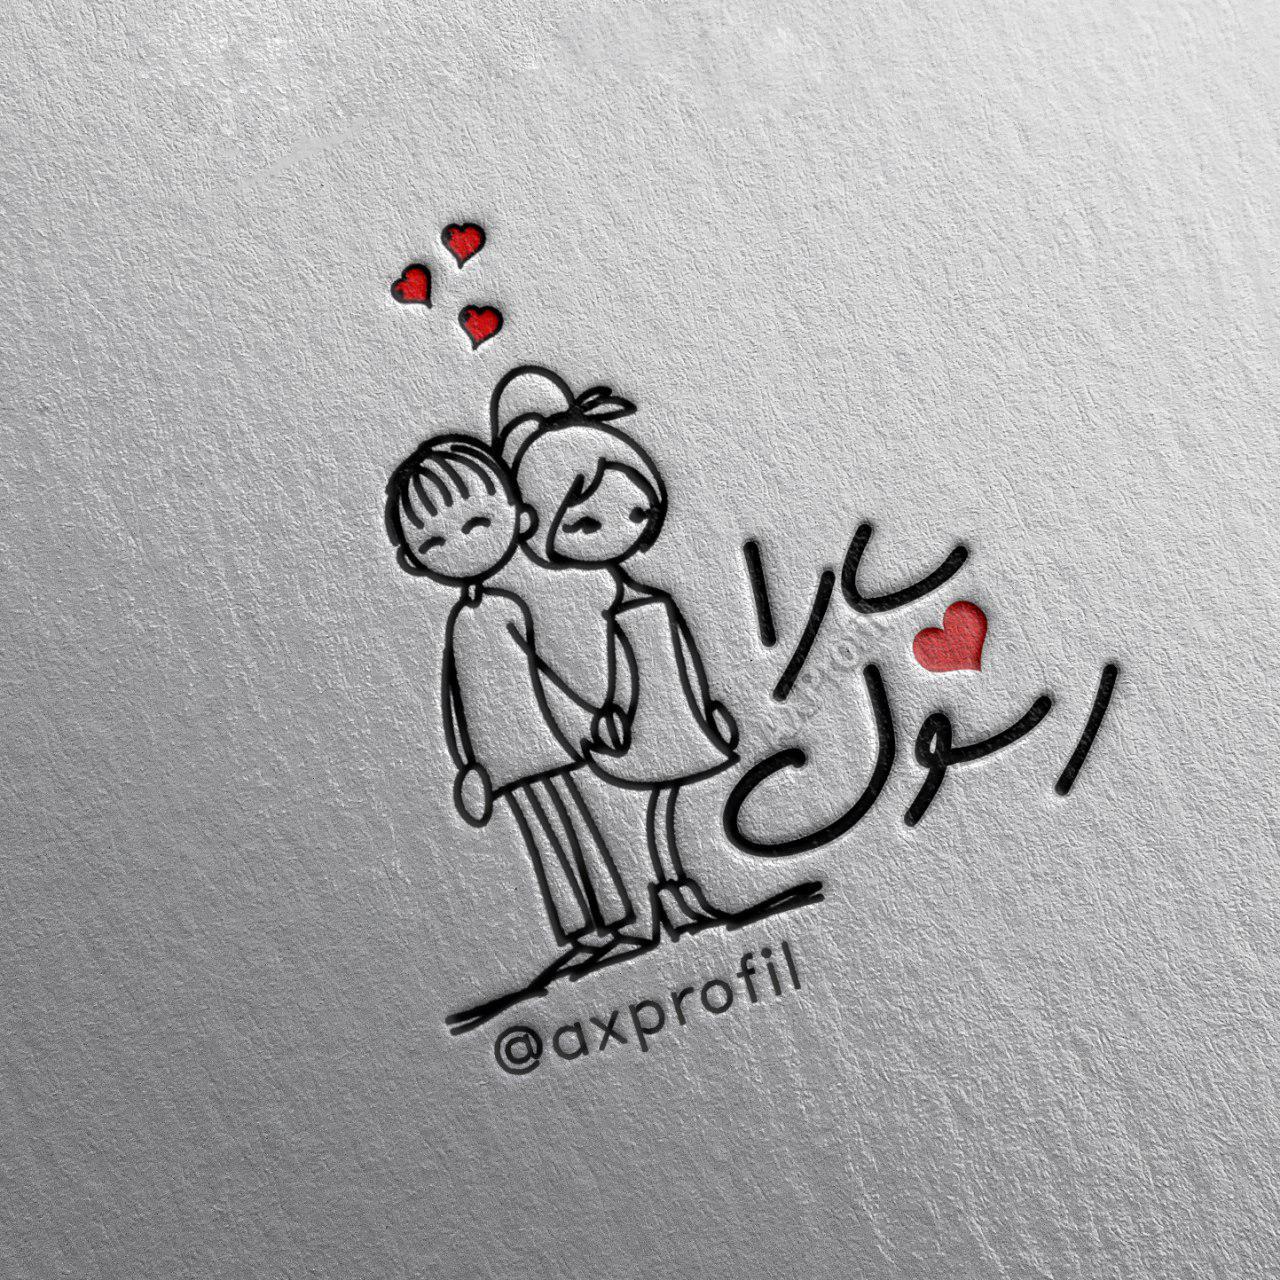 طرح گرافیکی لوگو اسم عاشقانه اسم رسول و سارا